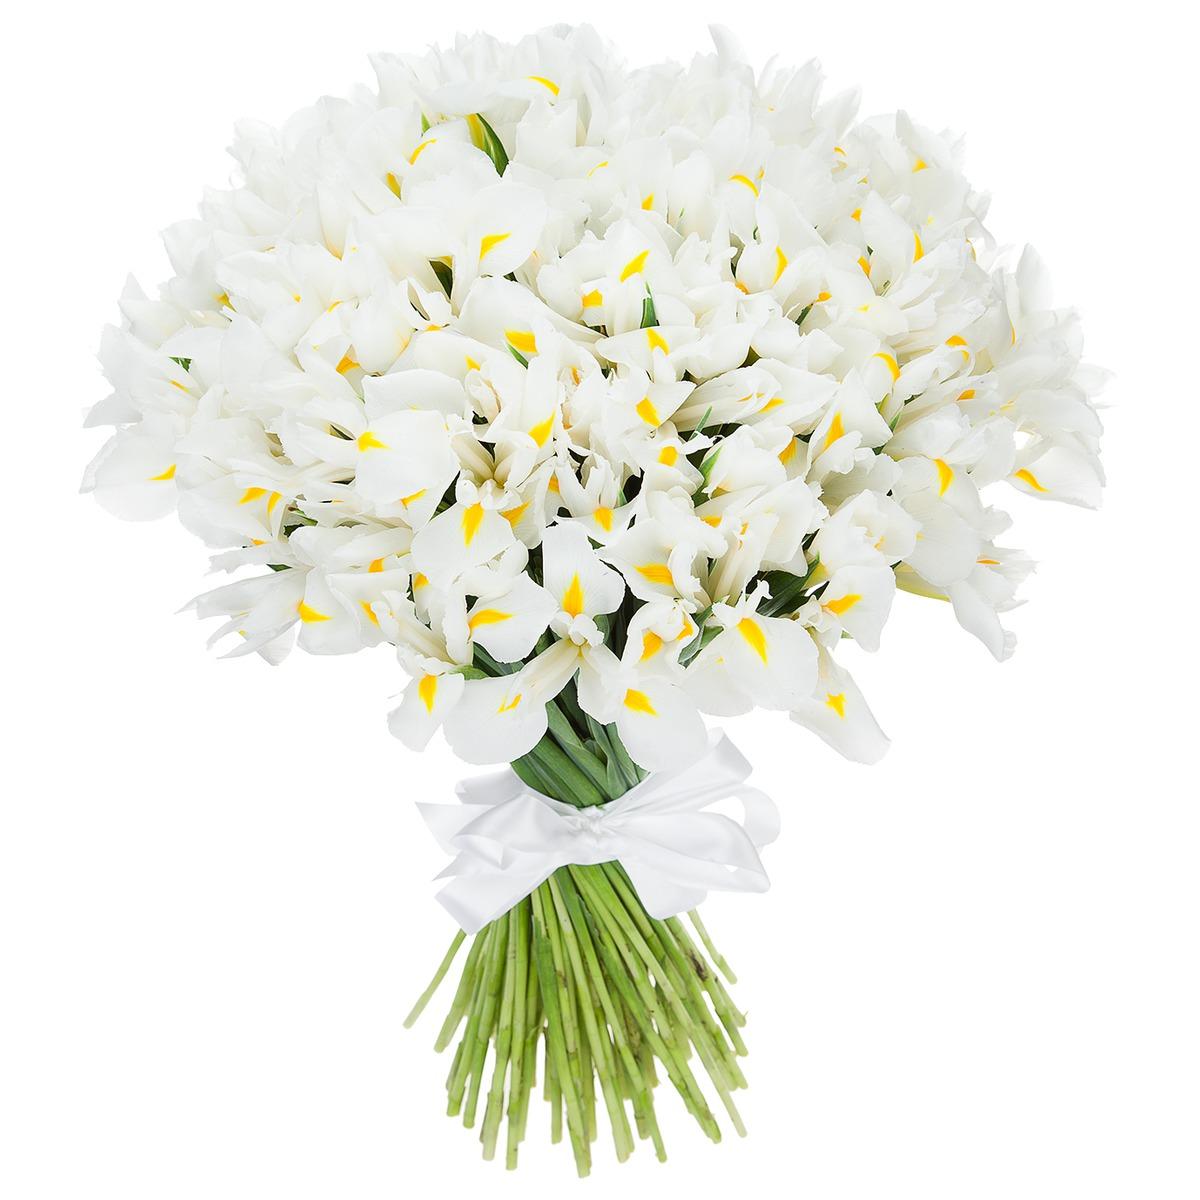 http://flower-world.com.ua/image/data/Flowers/Iris/b13.jpg